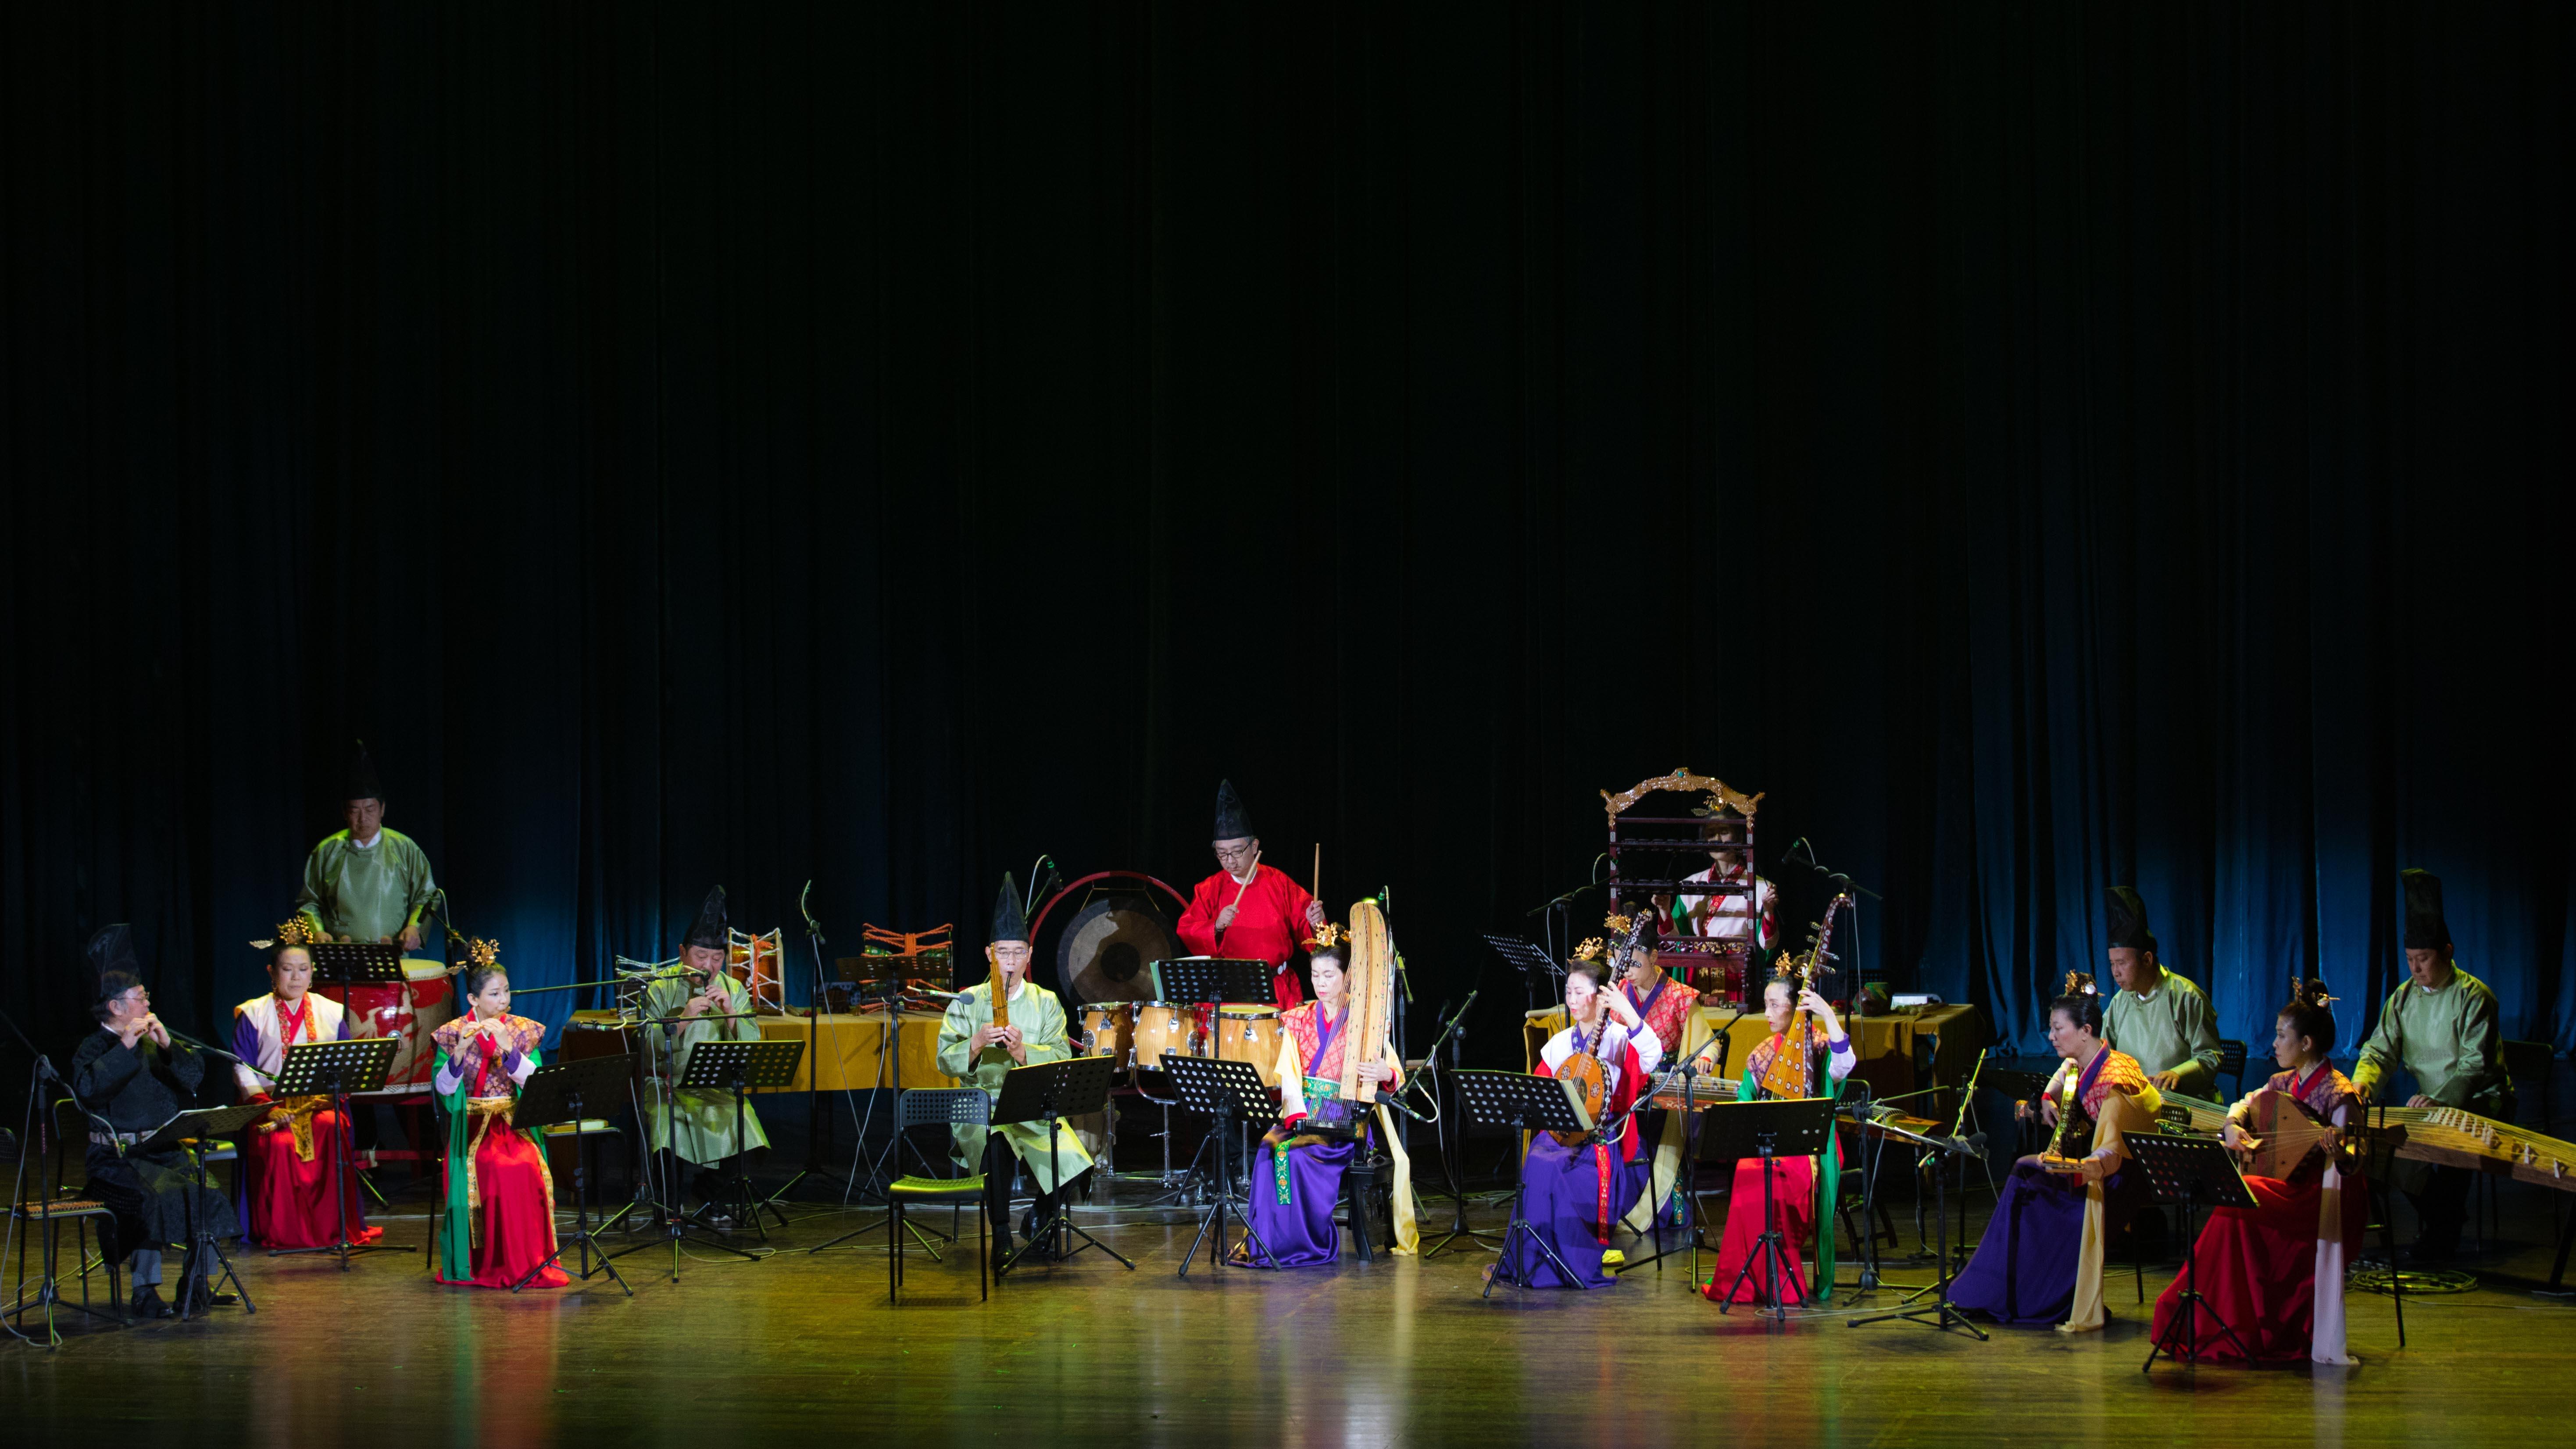 中国海口市で正倉院復元楽器の音楽会 中日韓の音楽家が共演